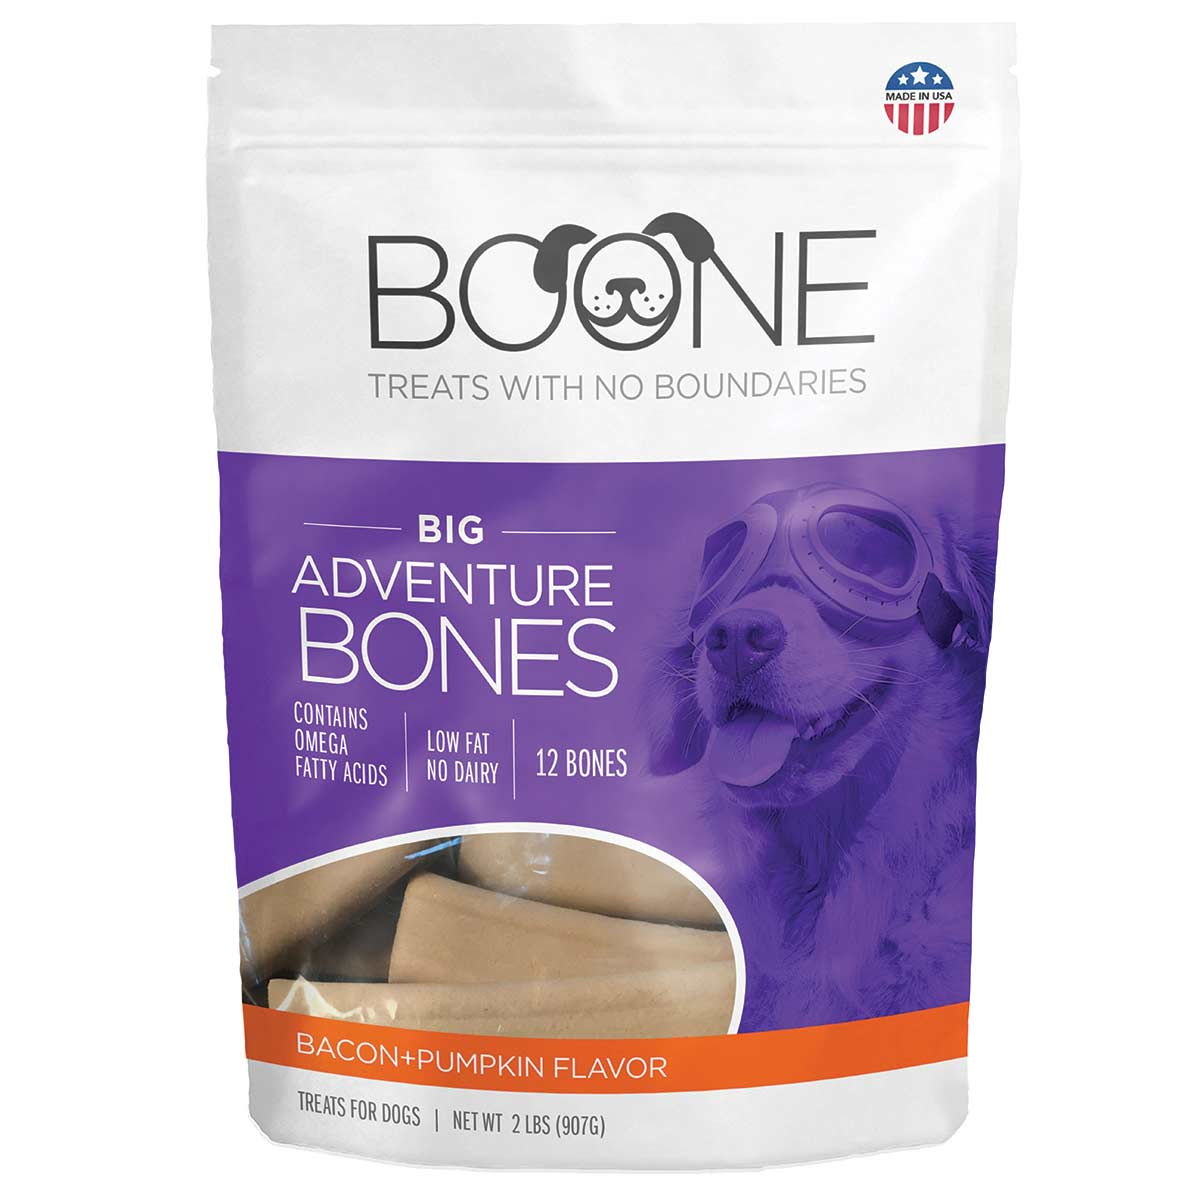 Boone Bones Bacon and Pumpkin Dog Chews 32 oz